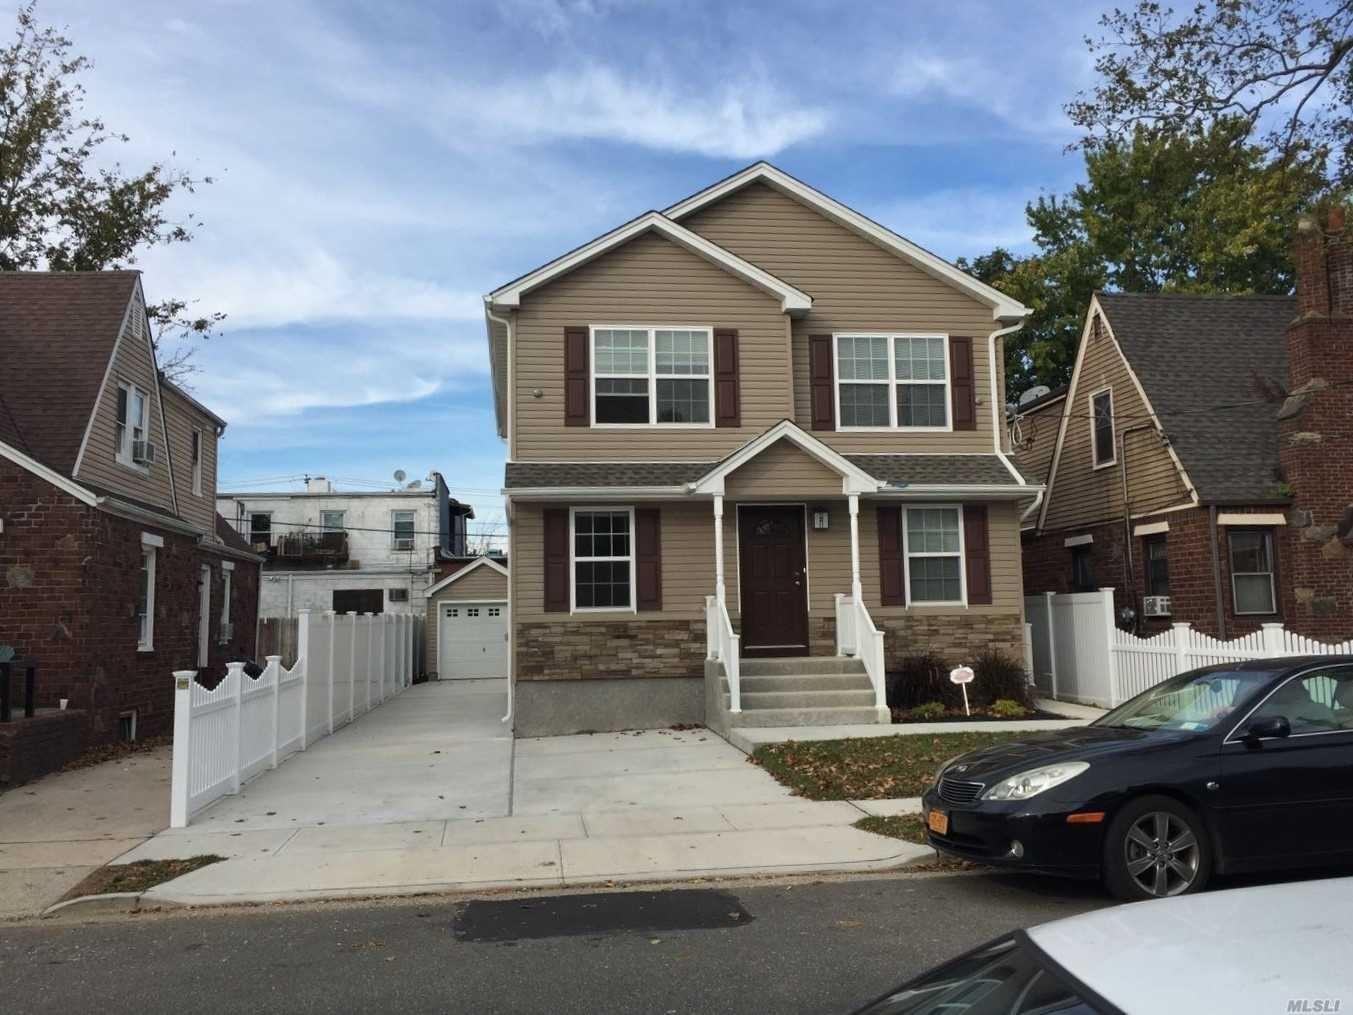 170 Ivy Street, West Hempstead, NY 11552 - MLS#: 3238265